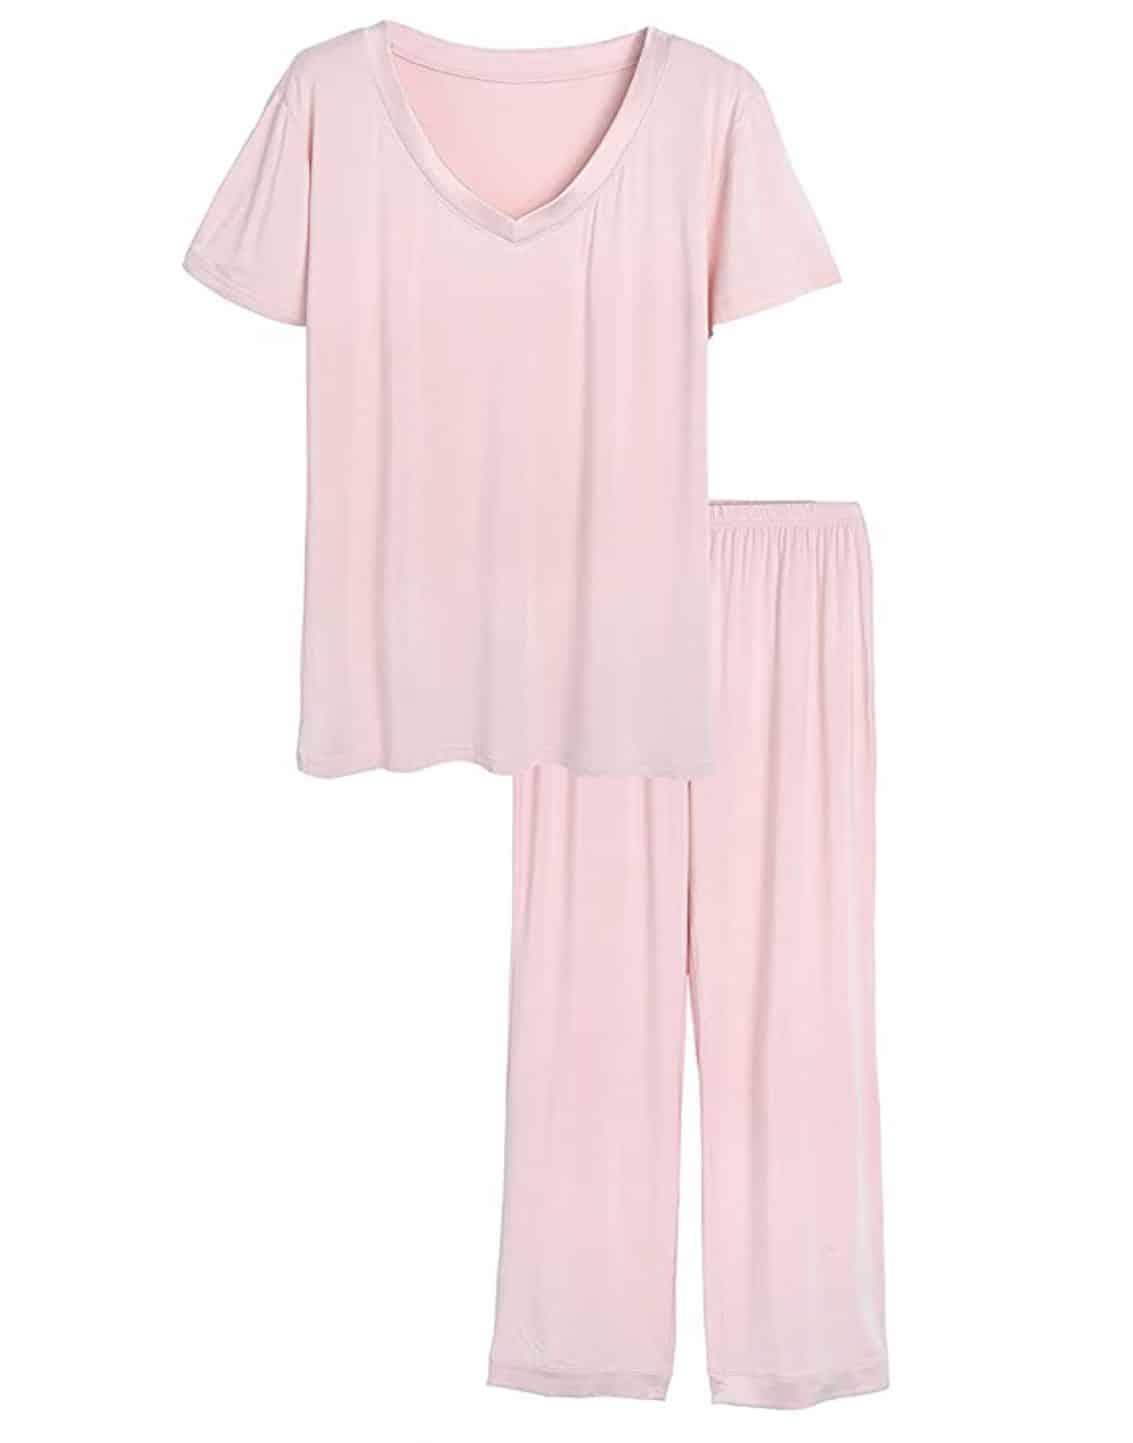 Womens-Pajama-set-christmas-gift-ideas-2020